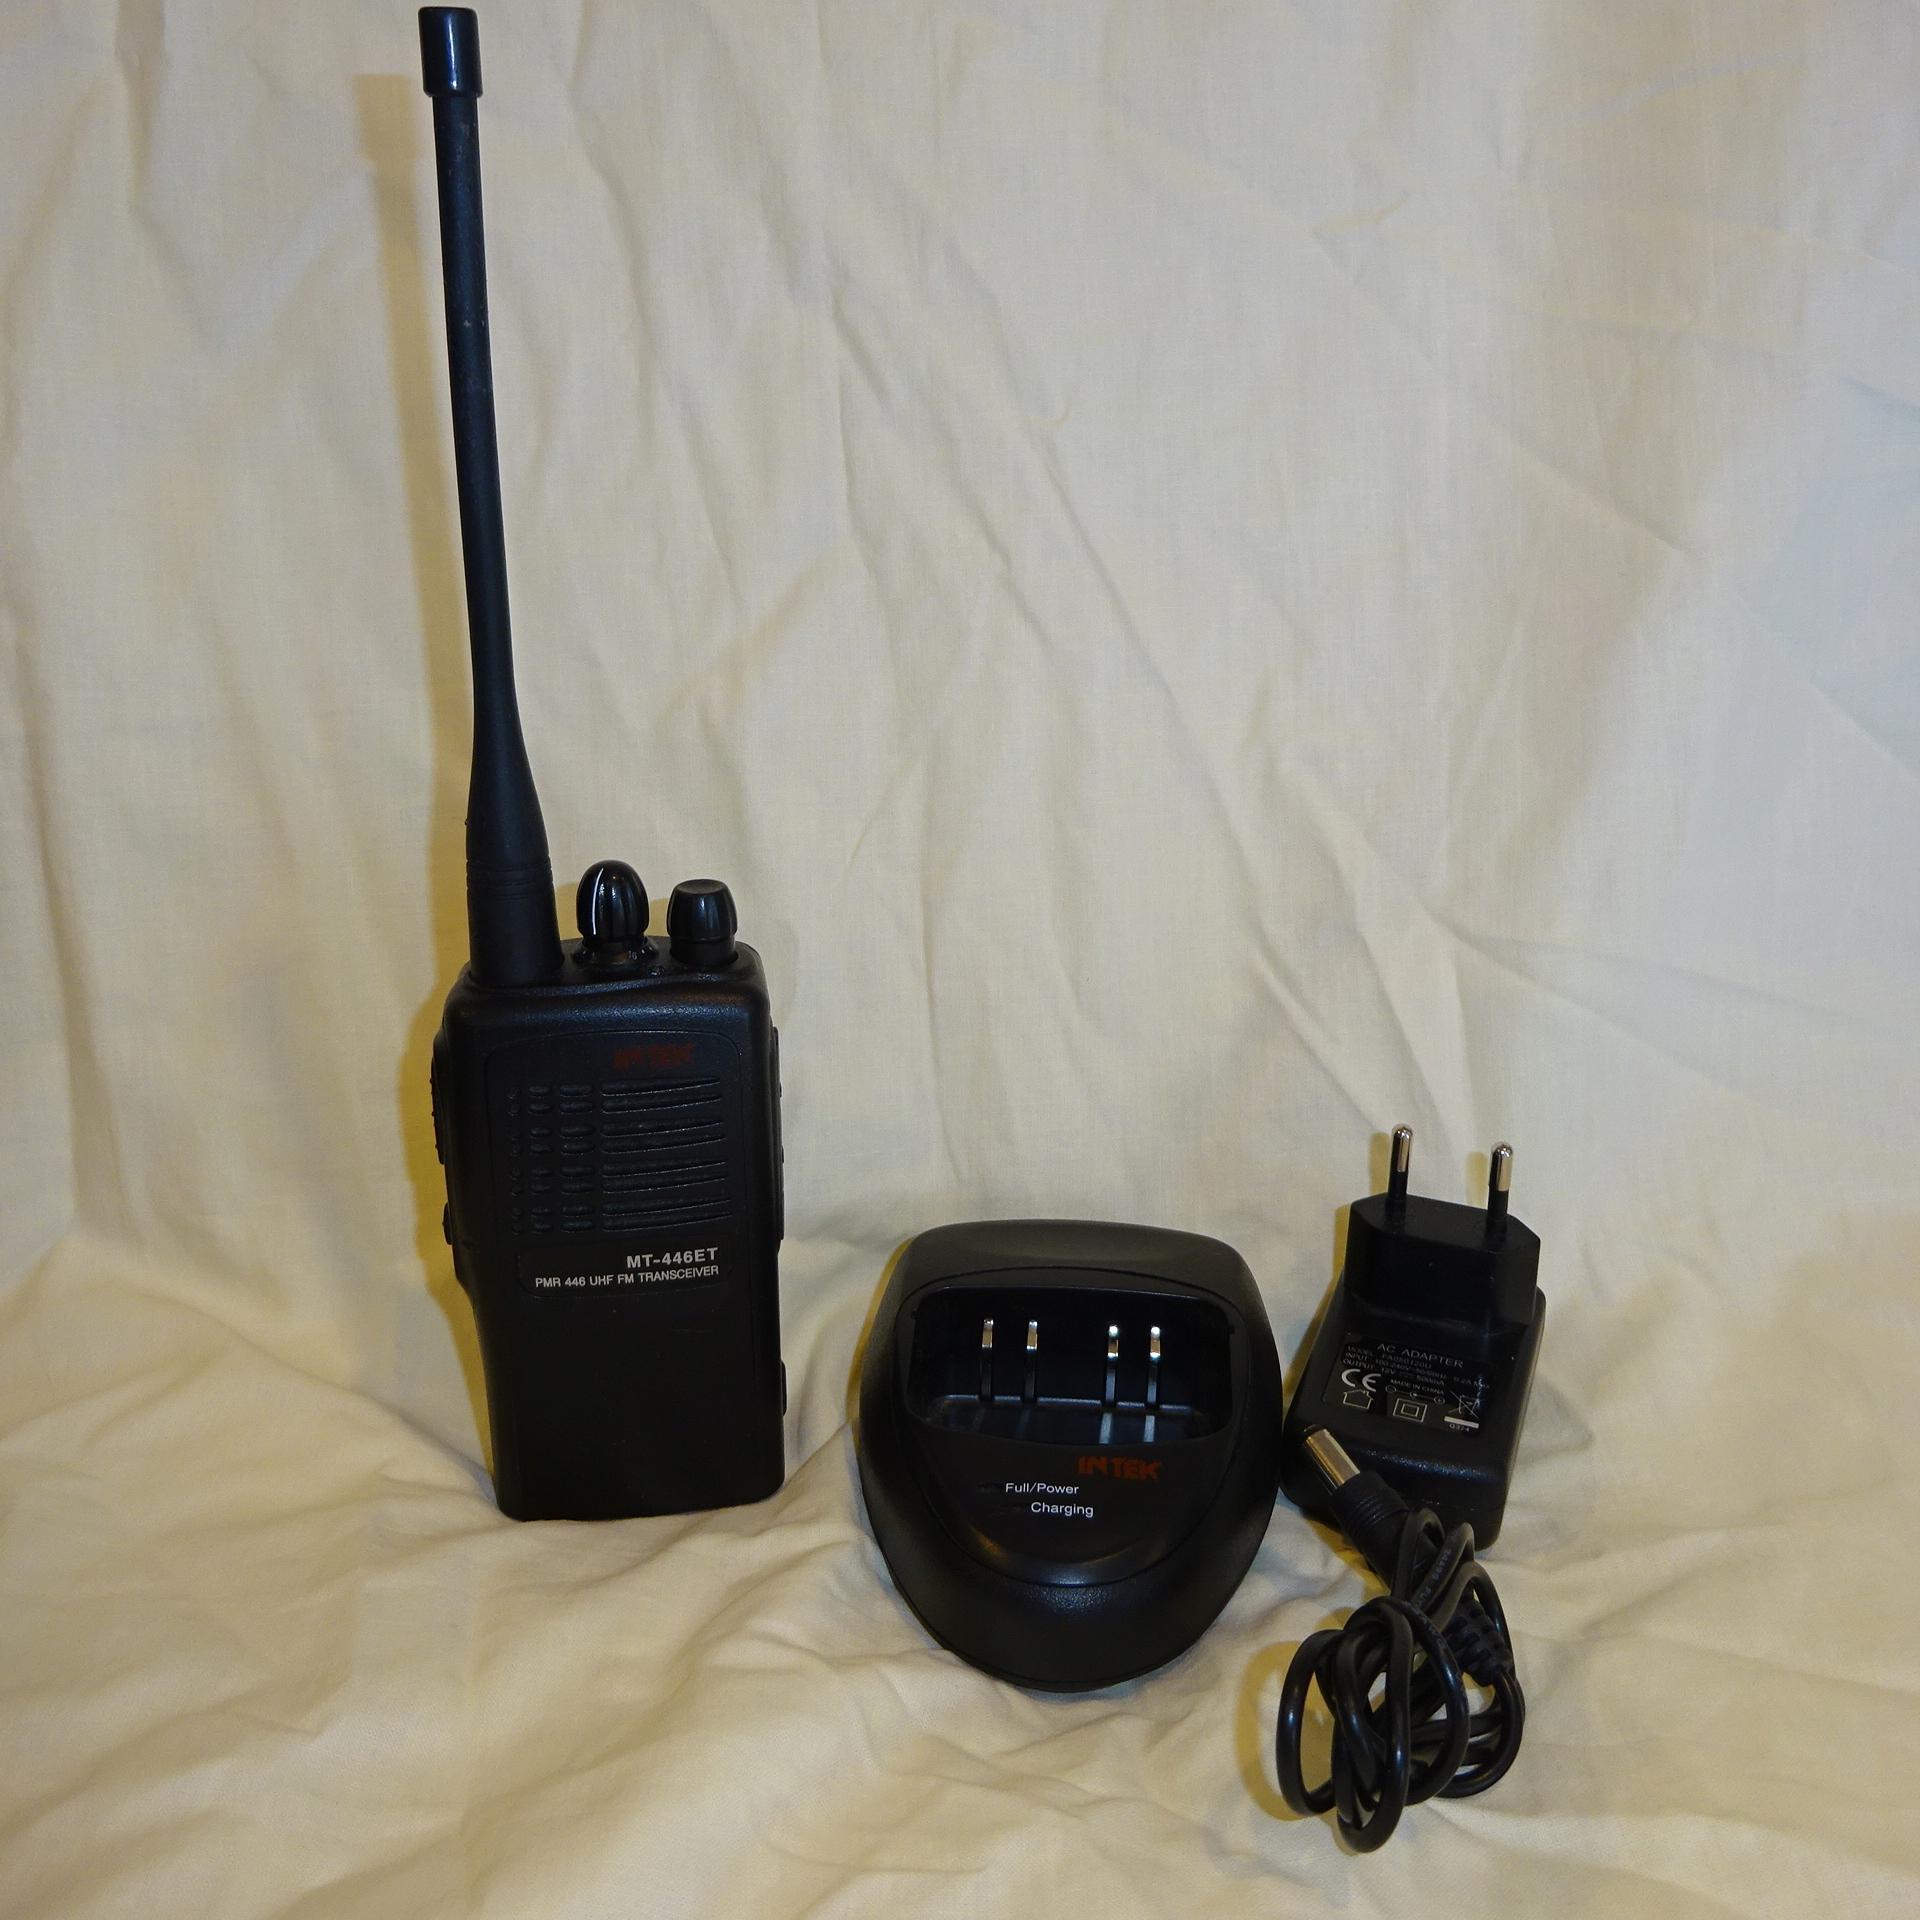 Radiotelefon Intek MT446ET